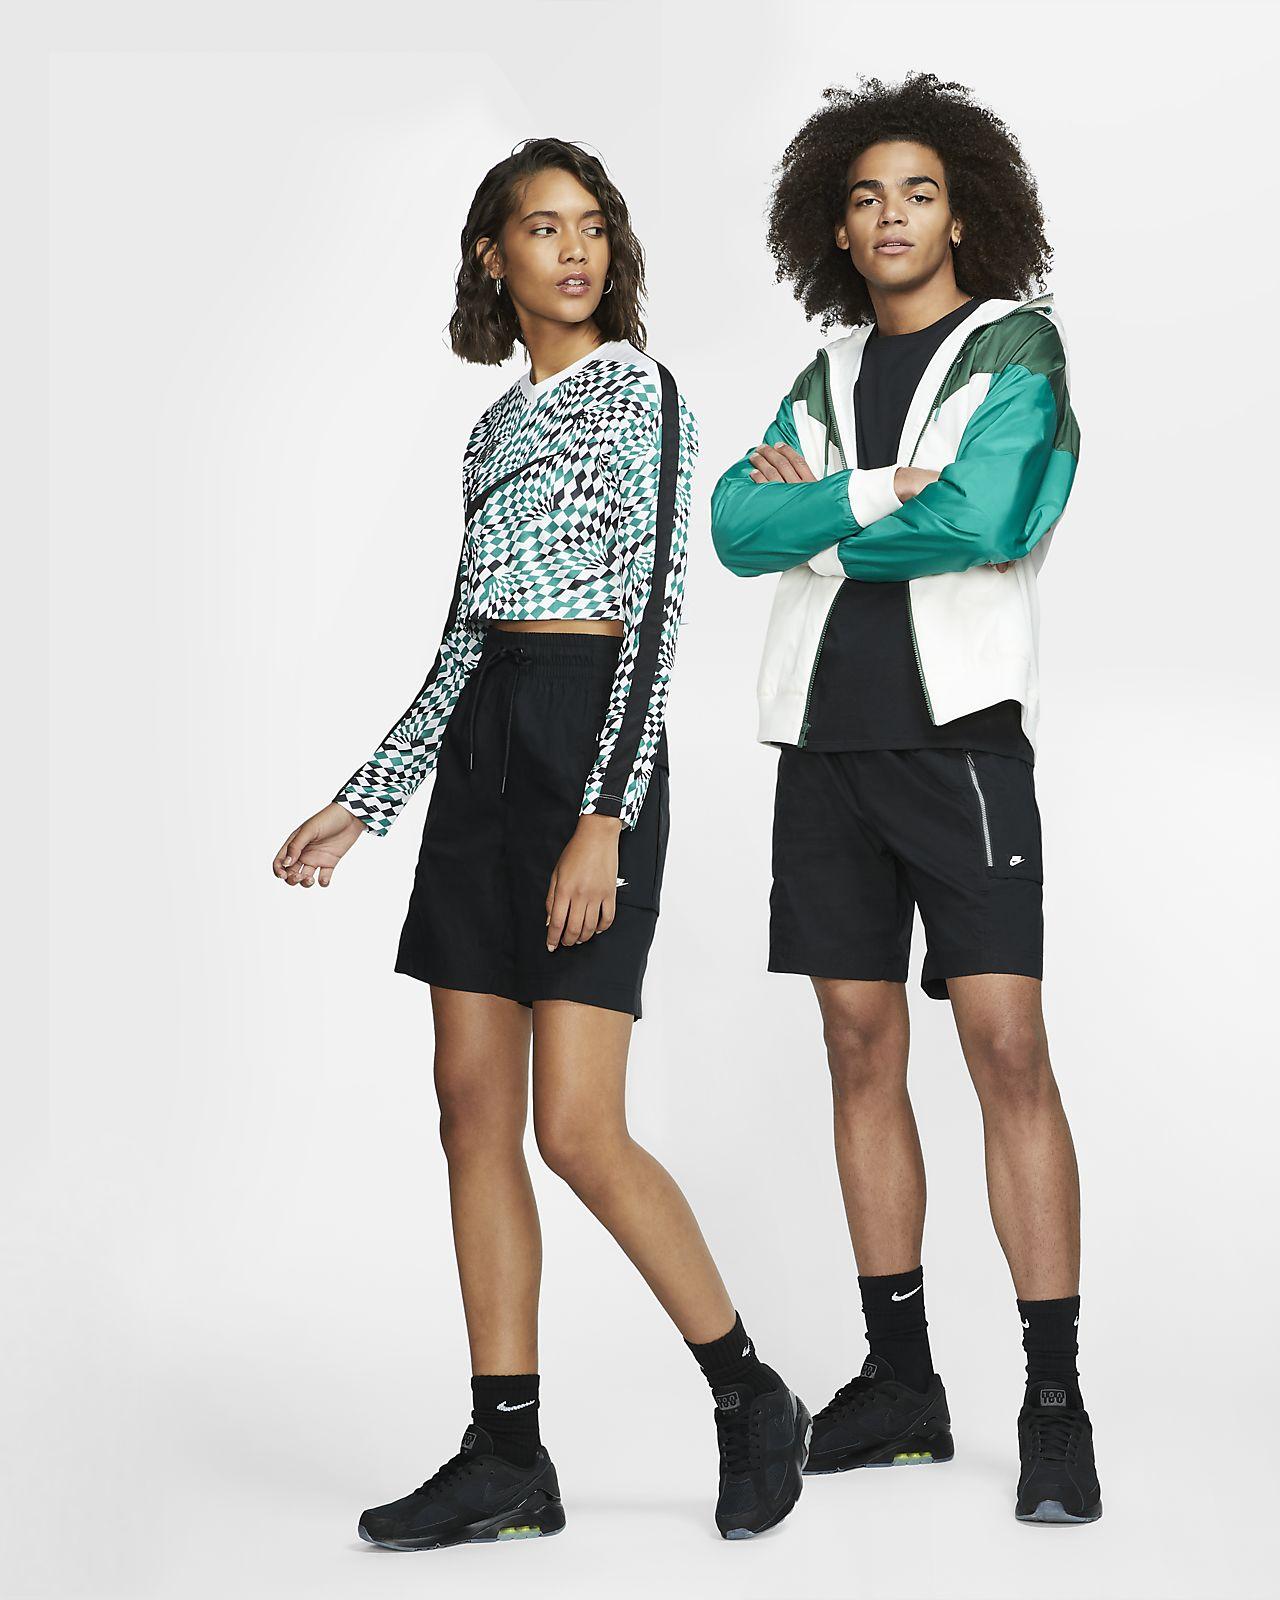 brand new 977a0 bf01e ... Cargoshorts Nike Sportswear för män